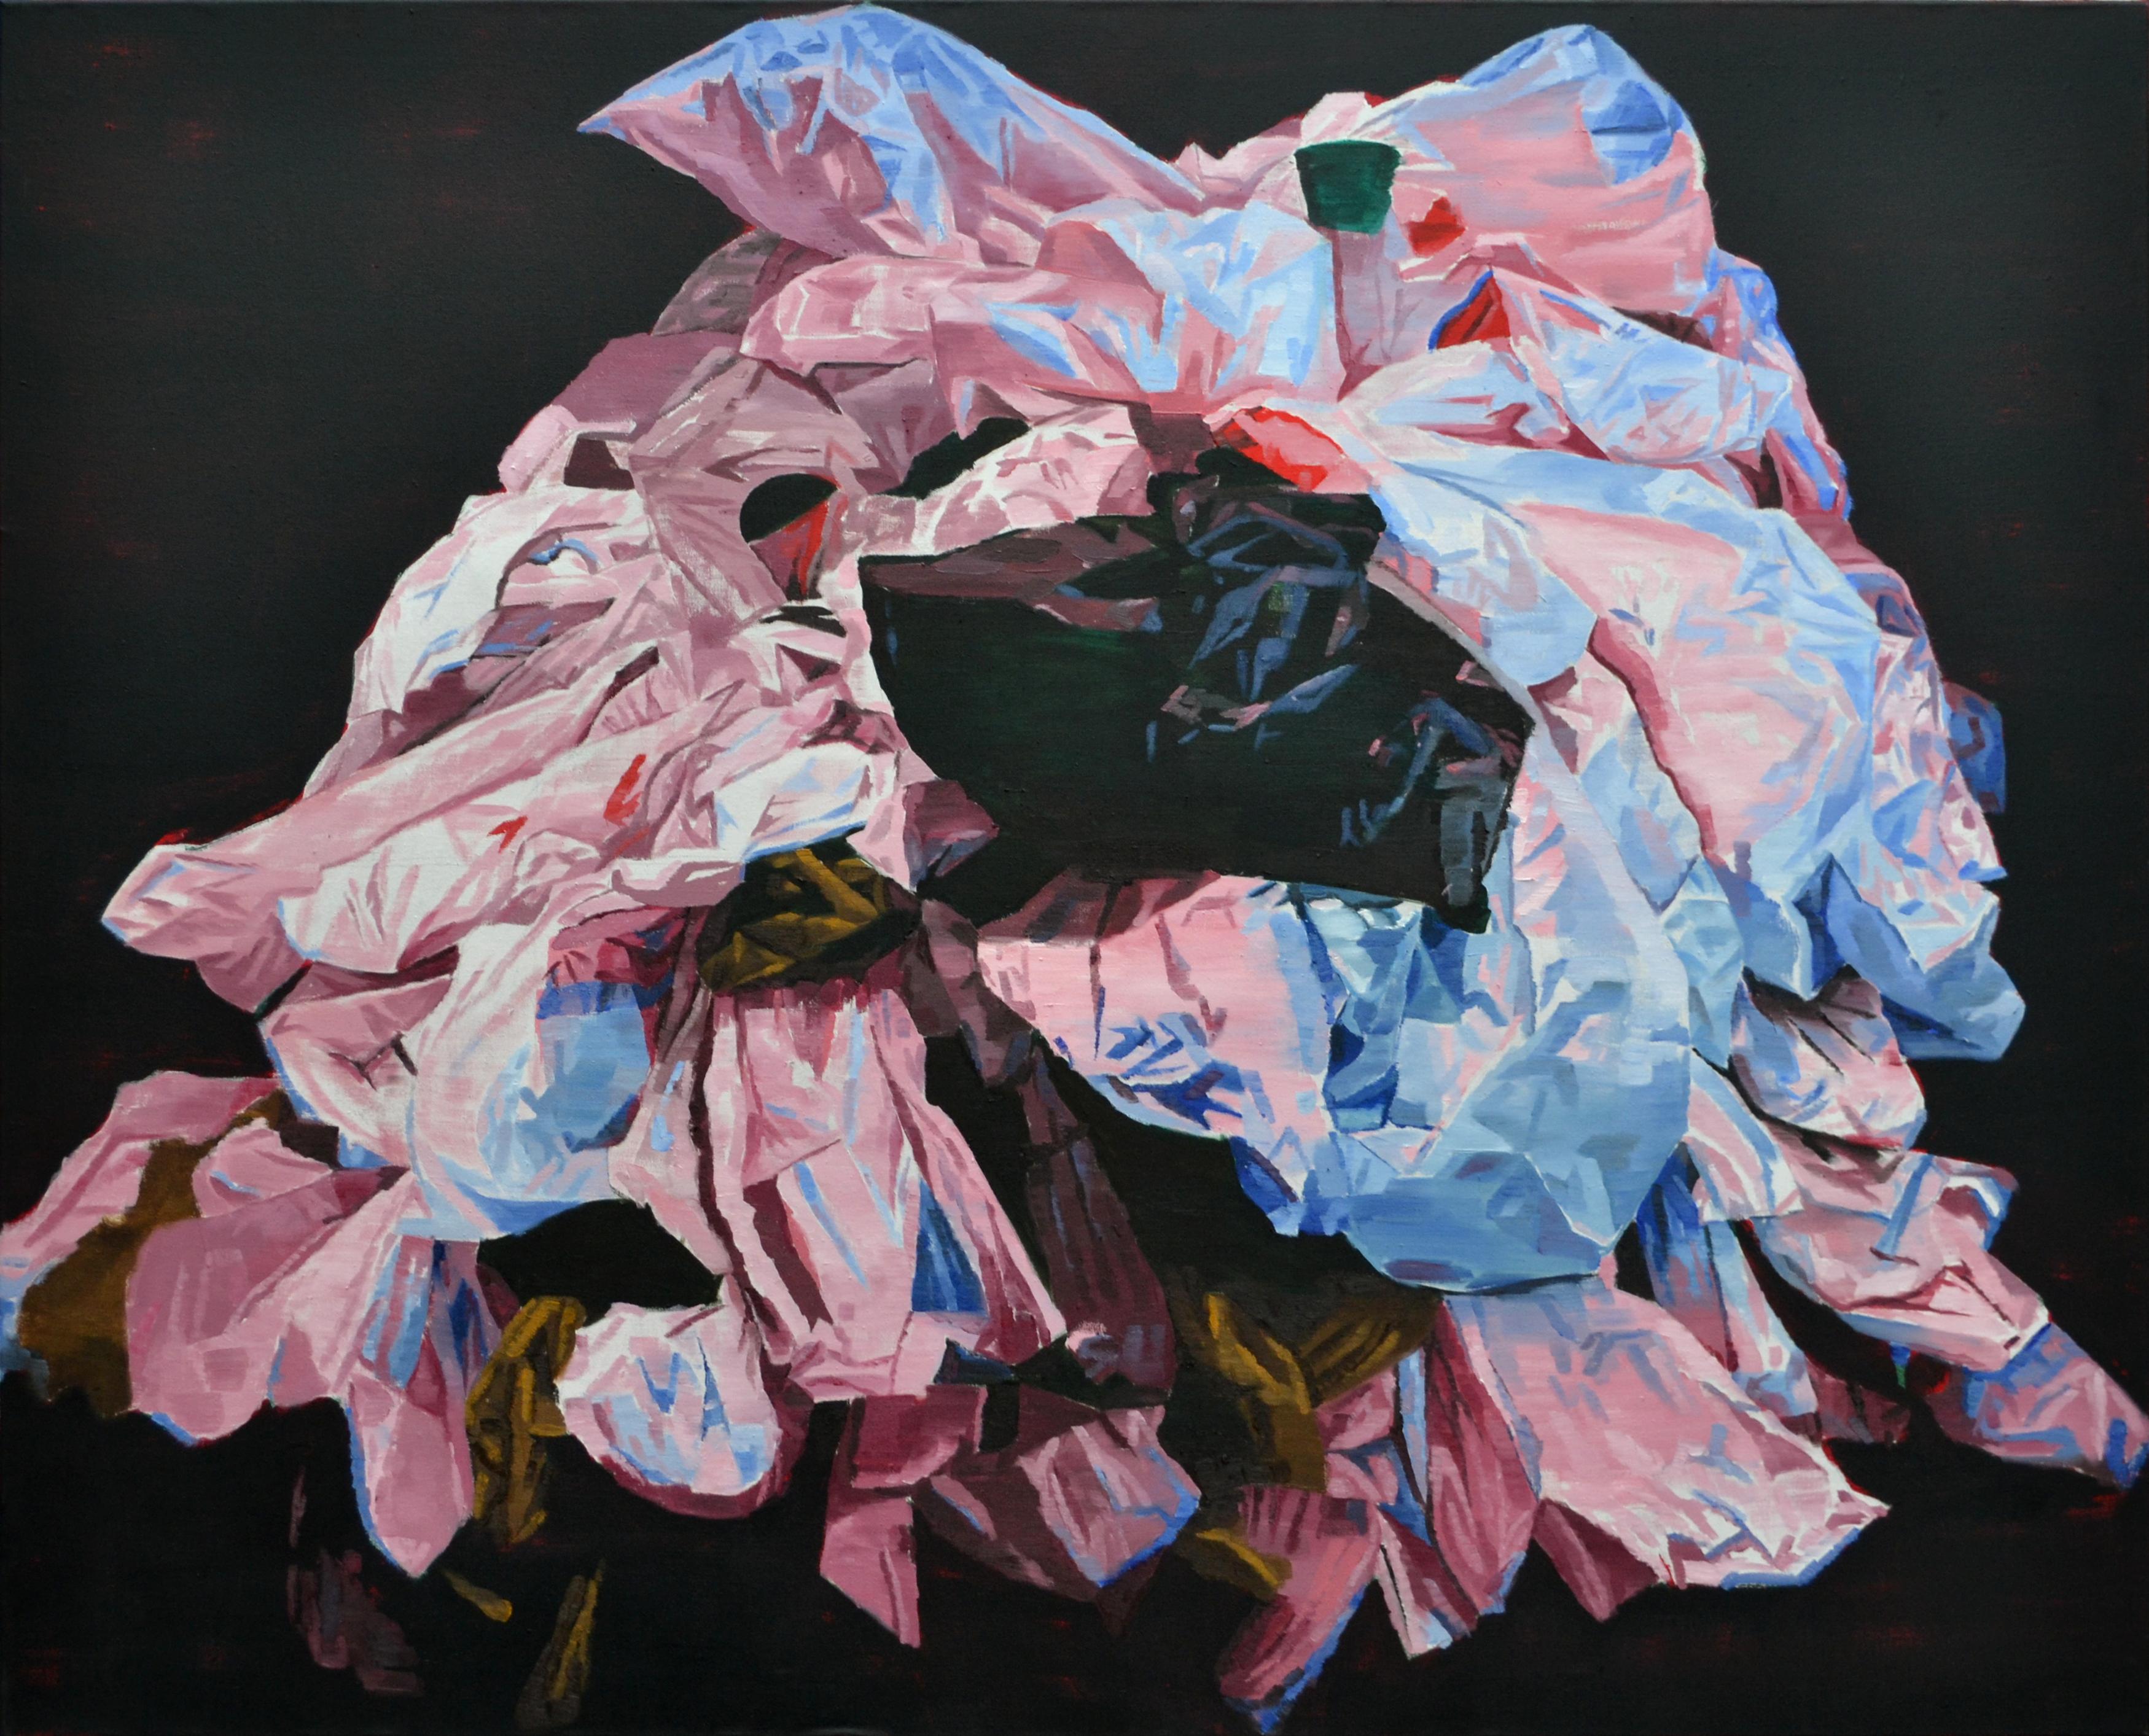 (2015) Plastic in the dark